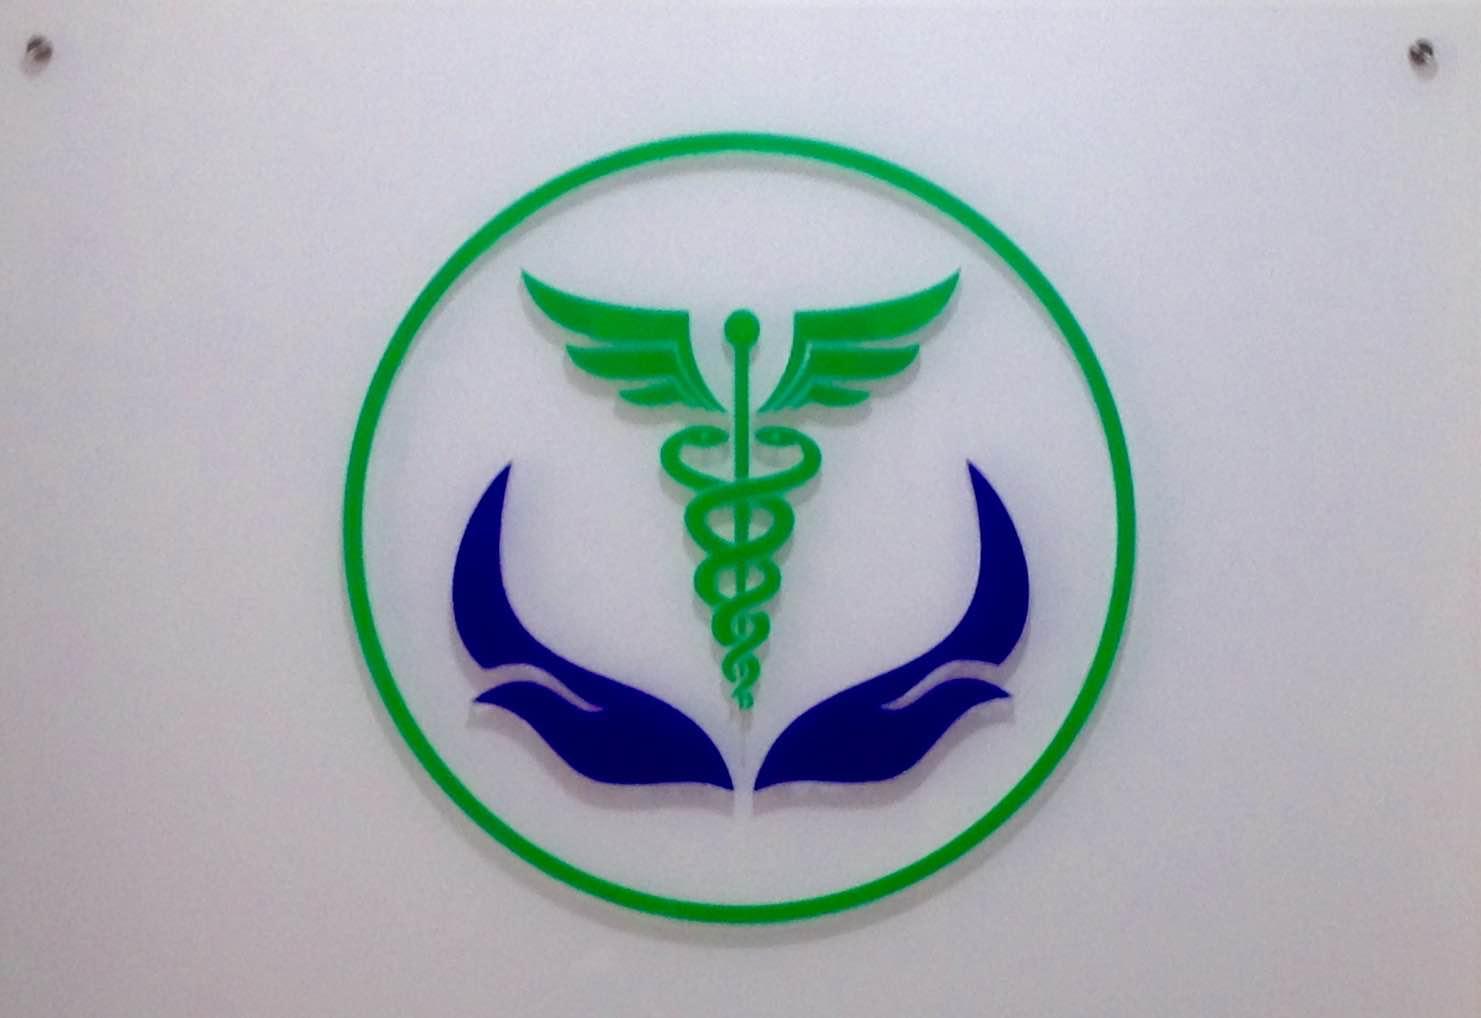 Maxcare Hospital